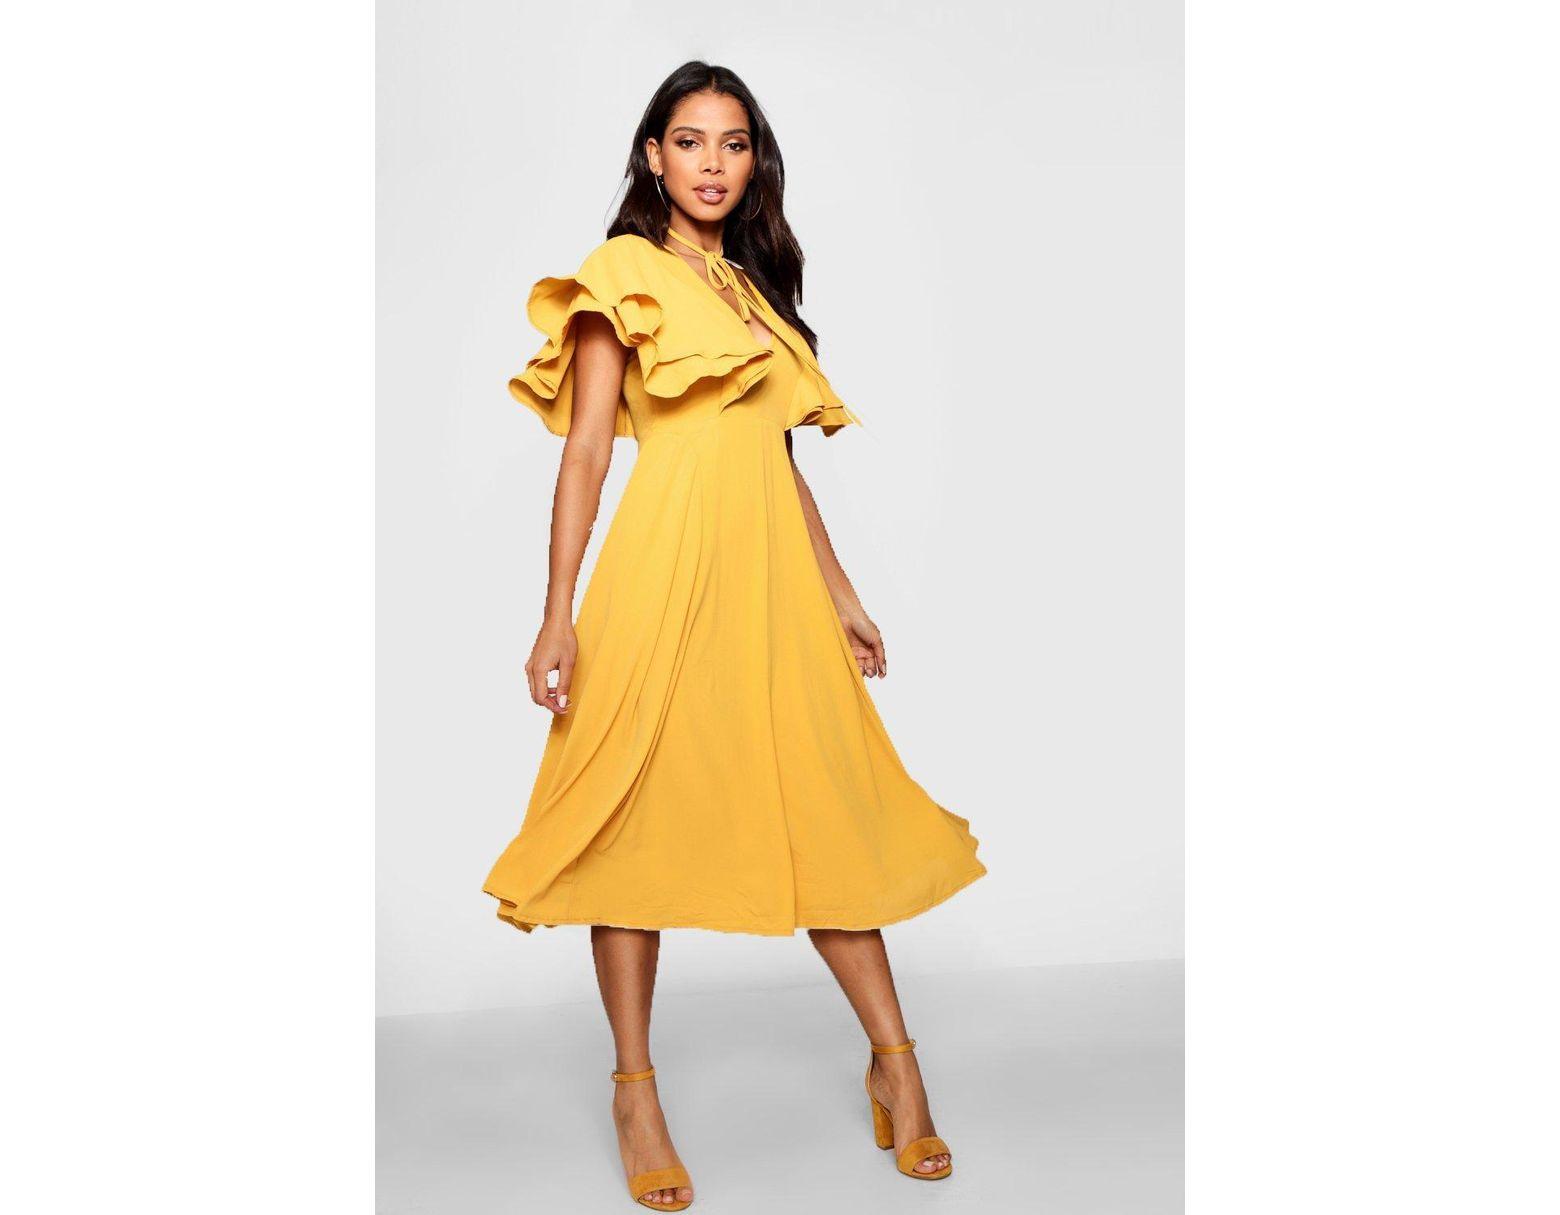 a2d52dc2cd2f Boohoo Ruffle Angel Sleeve Bolo Tie Midi Dress in Yellow - Lyst